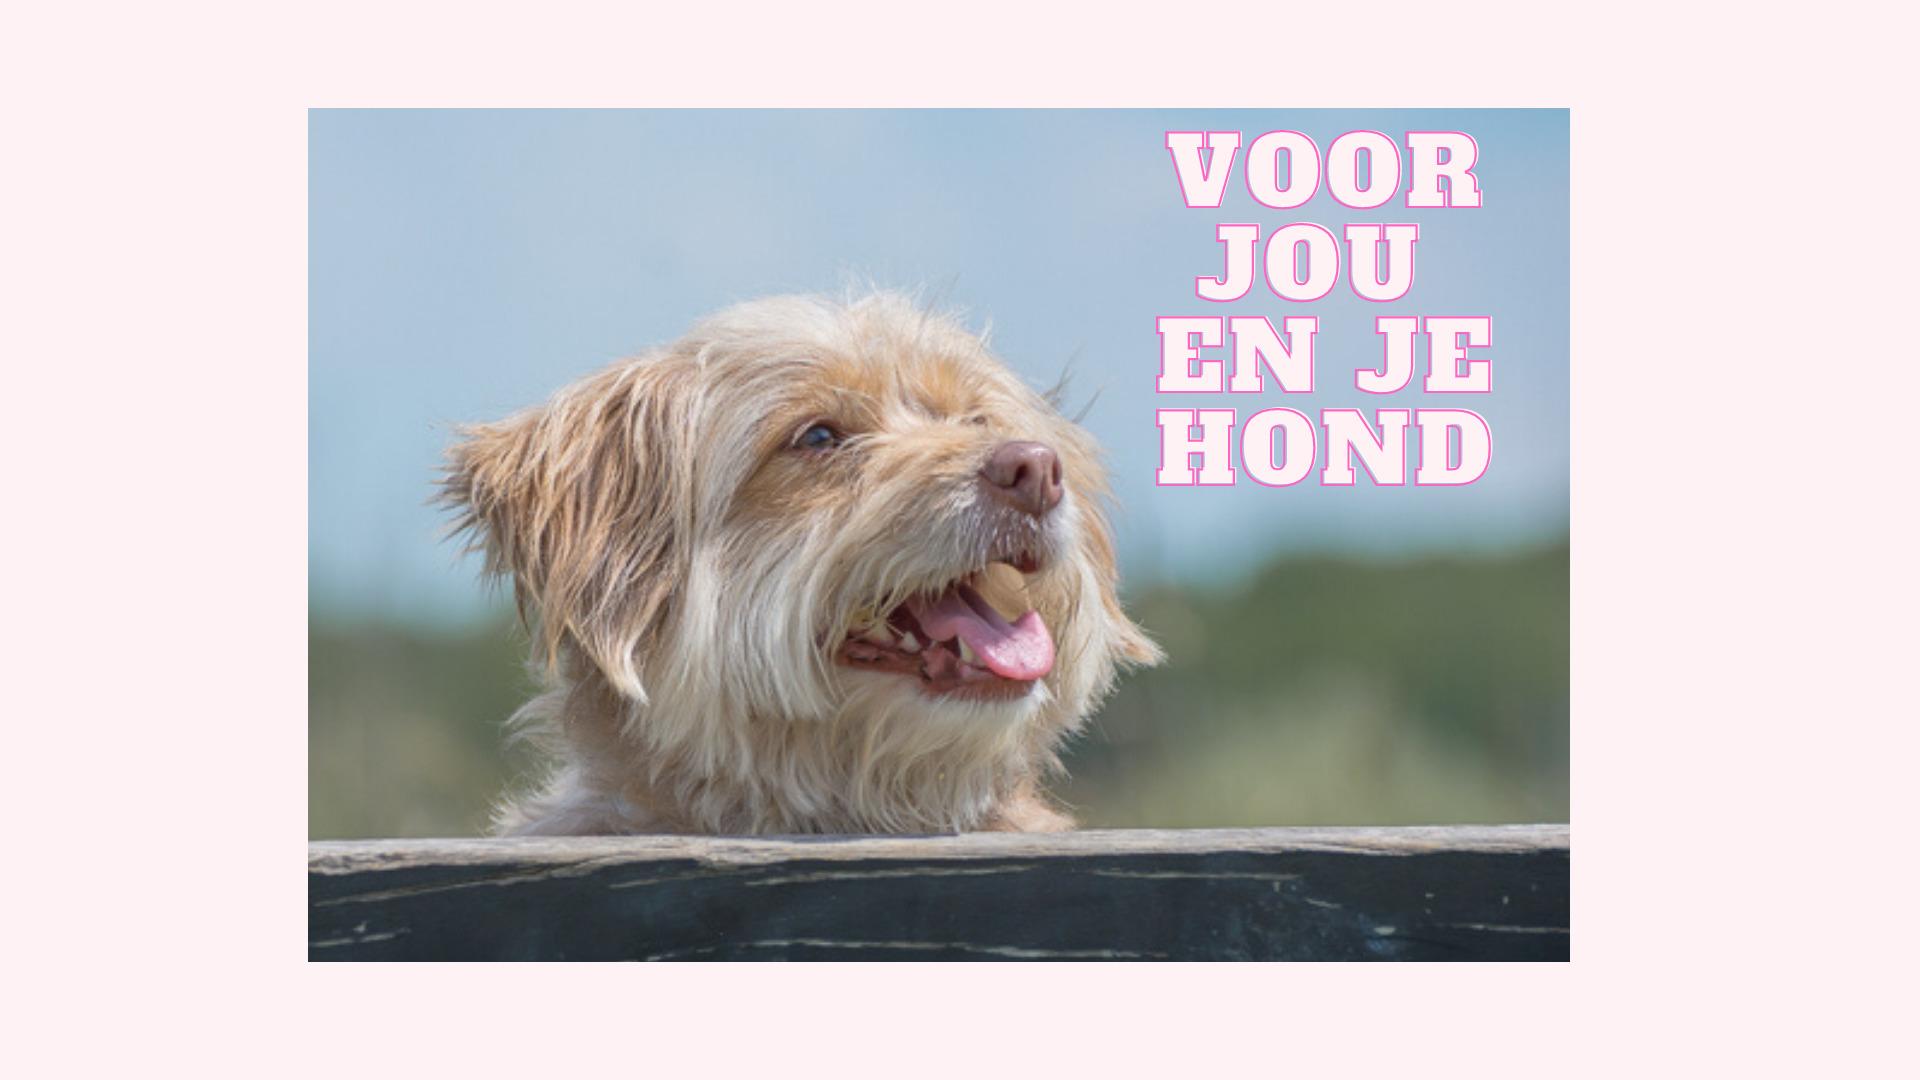 Voor jou en je hond